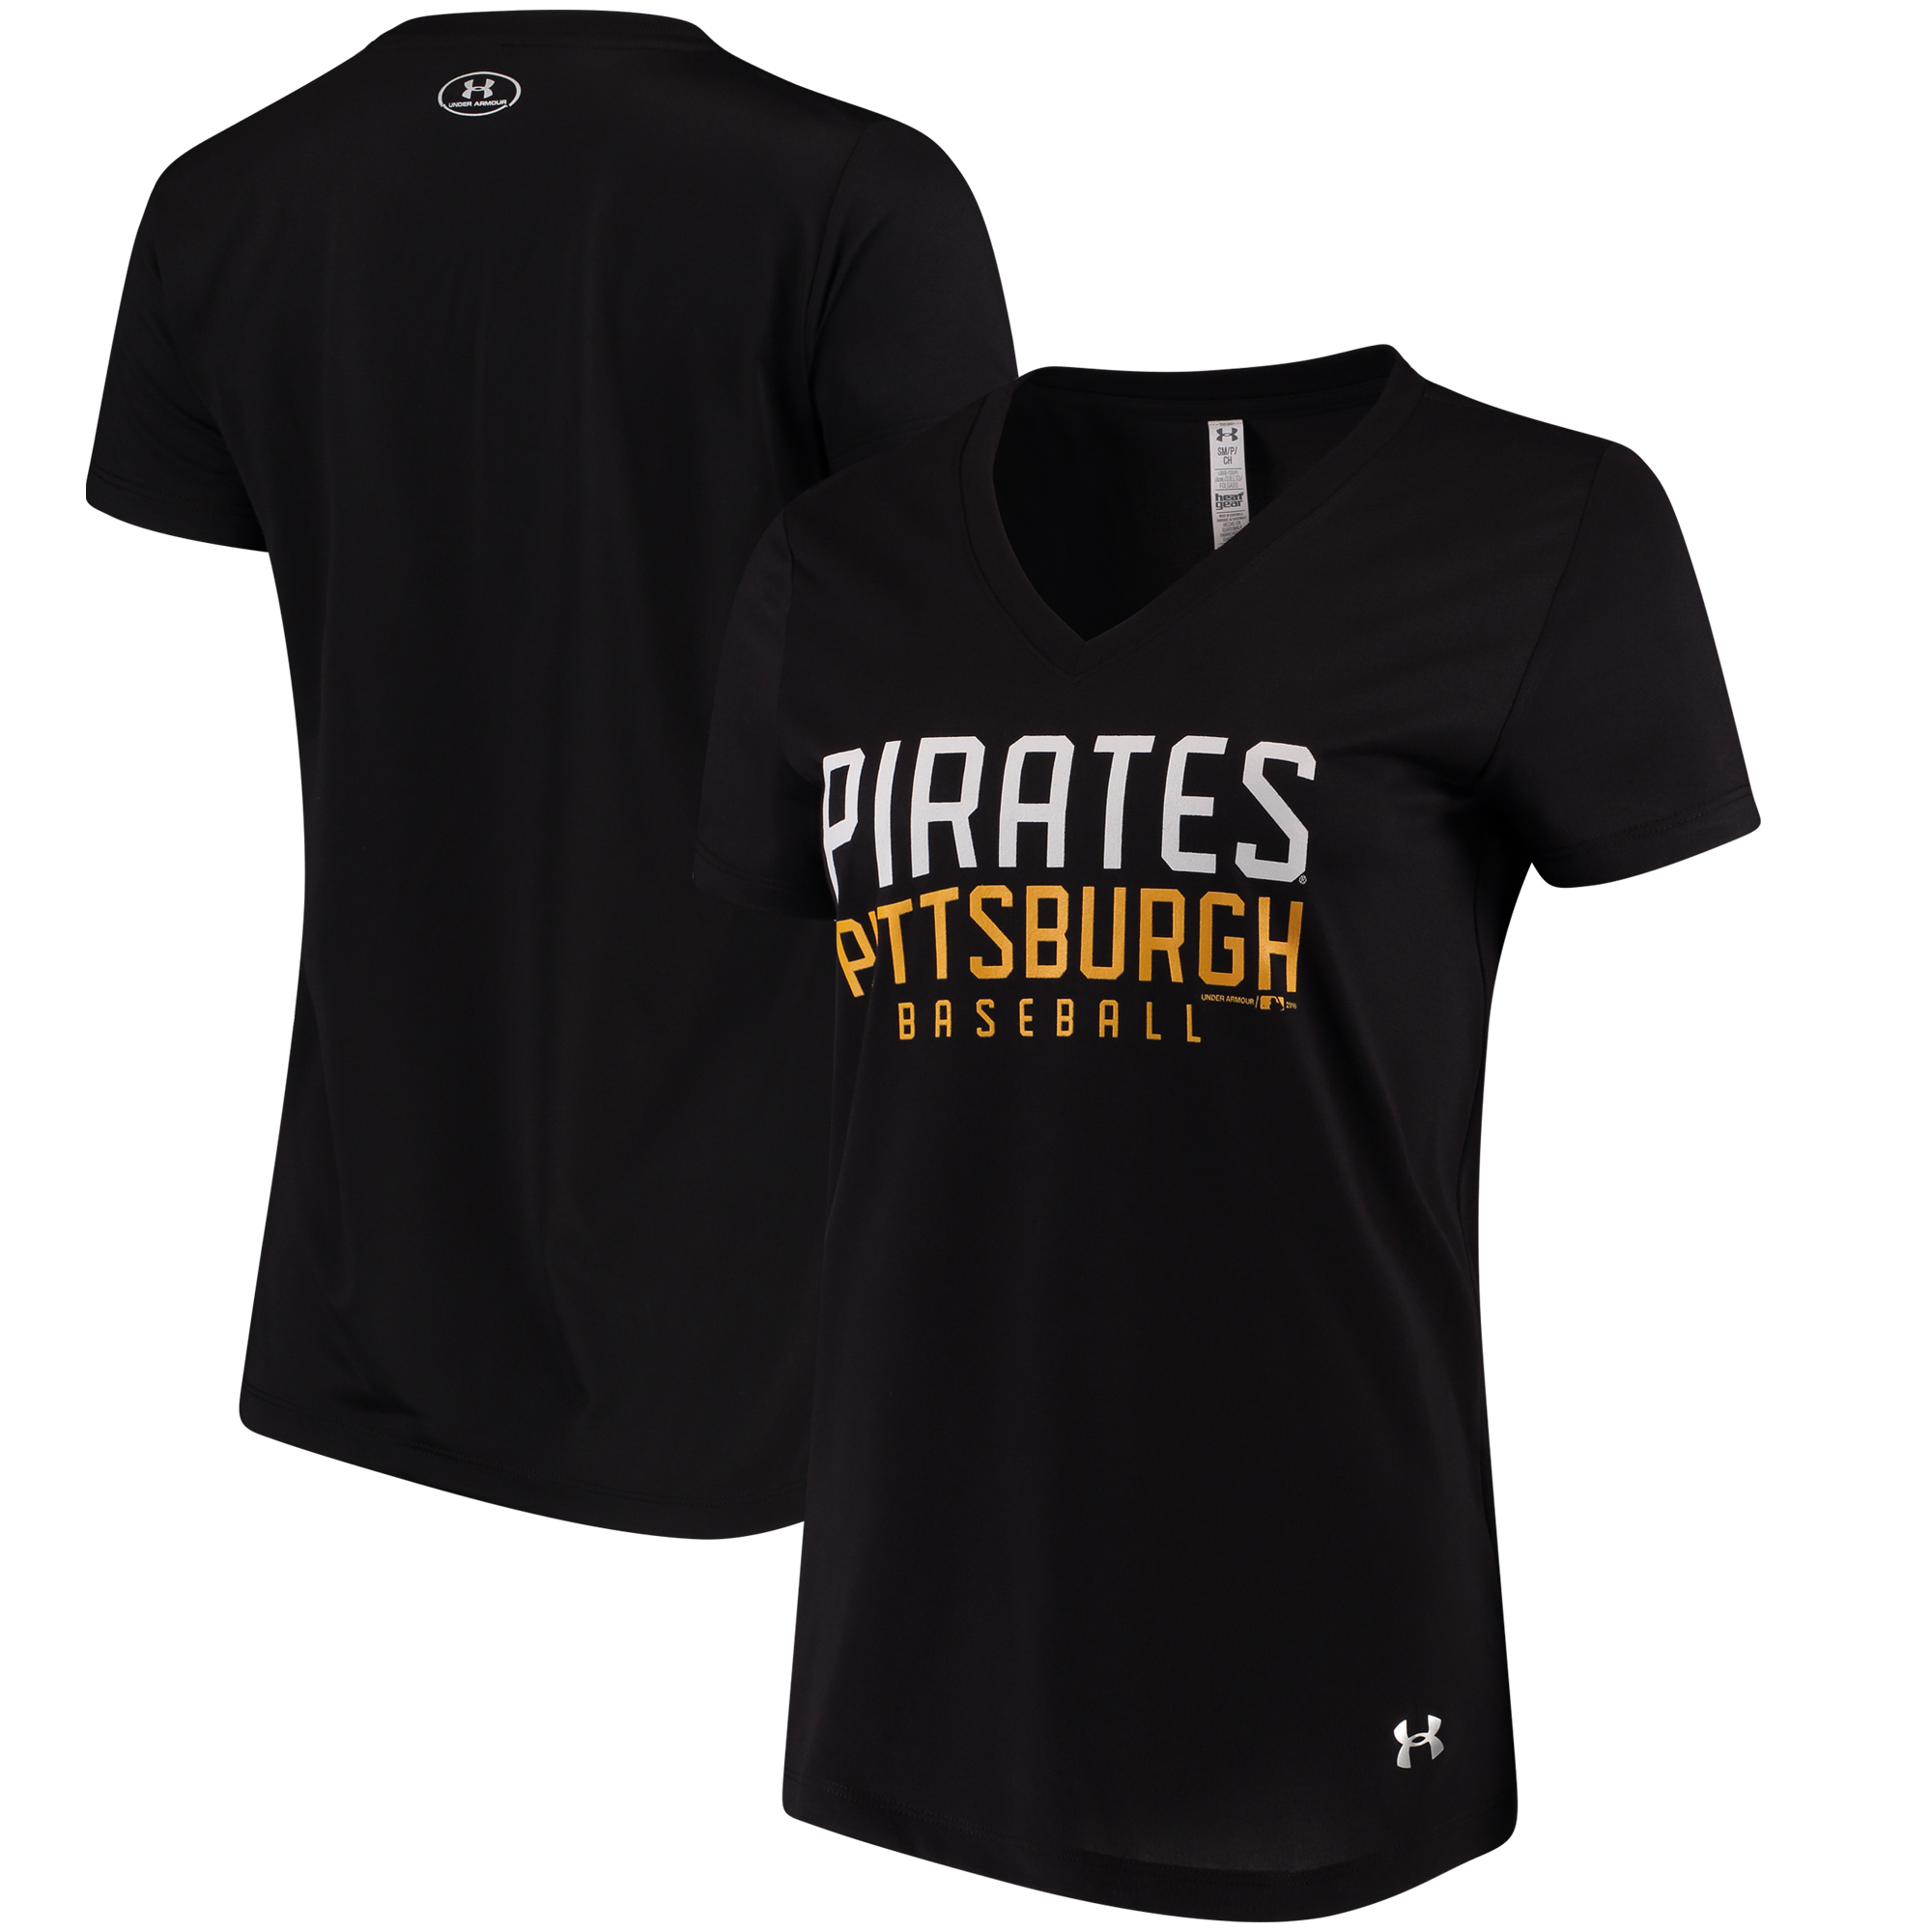 Pittsburgh Pirates Under Armour Women's Tech Performance V-Neck T-Shirt - Black